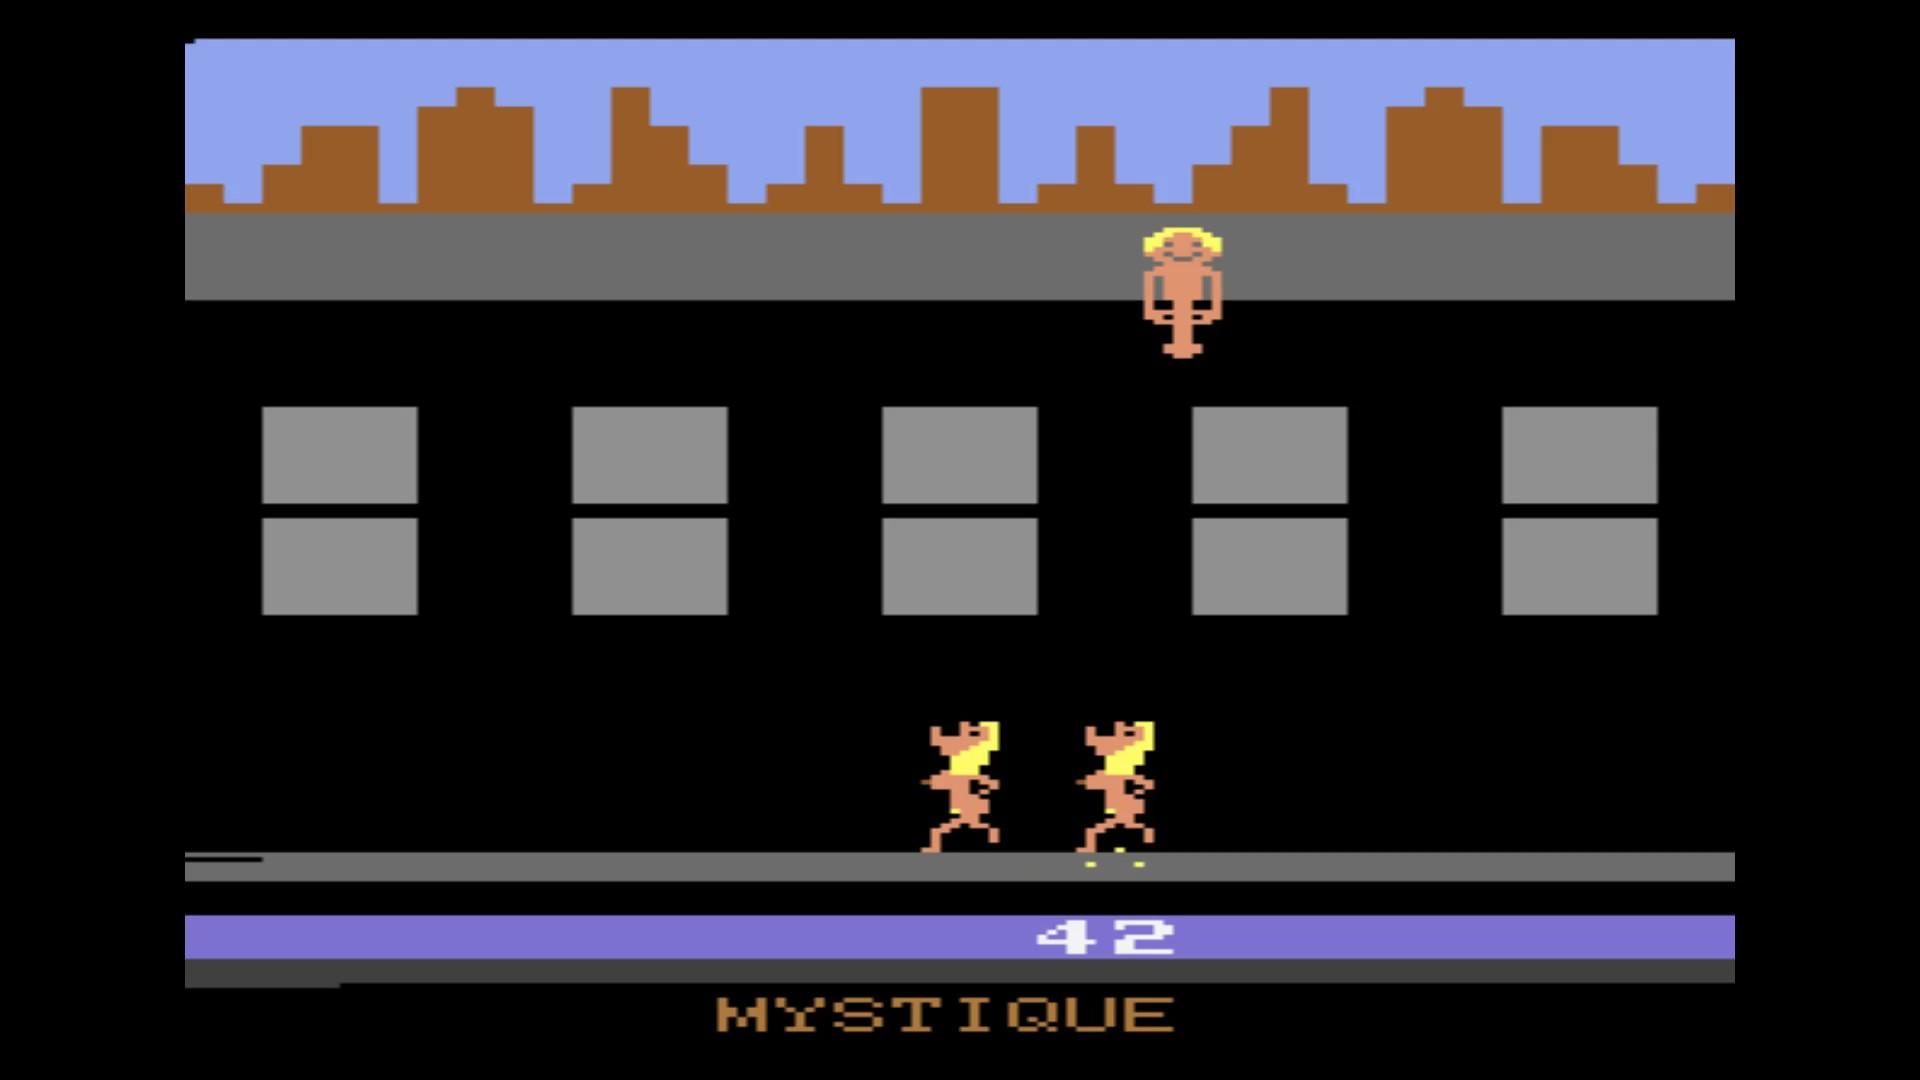 AkinNahtanoj: Beat Em and Eat Em (Atari 2600 Emulated Expert/A Mode) 42 points on 2020-10-13 07:43:08